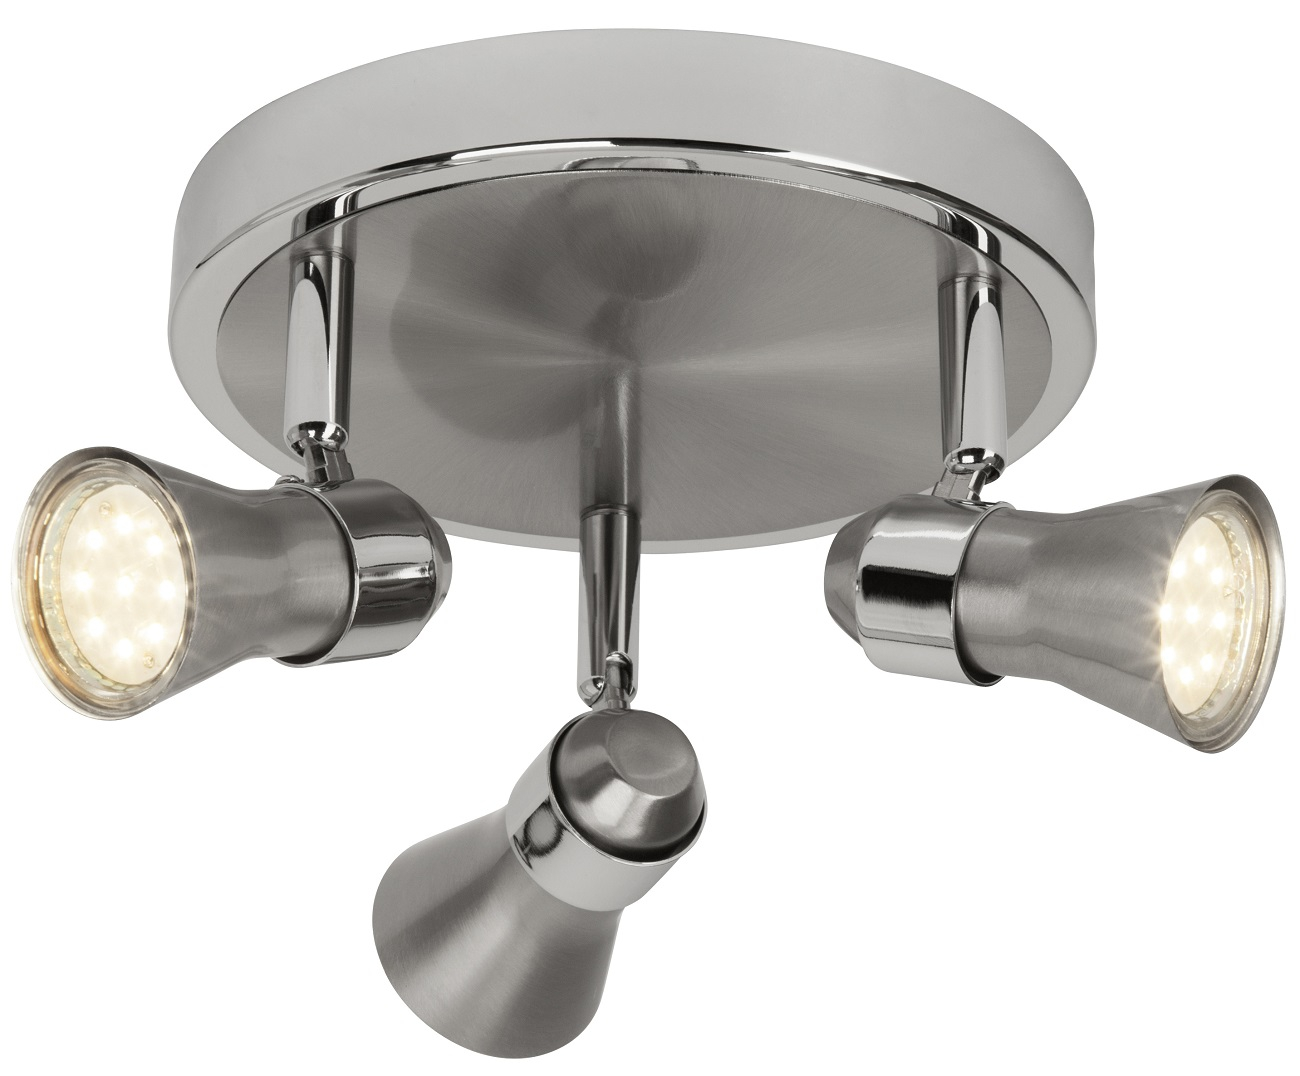 Plafondlamp Sonny 3xGU10 5Watt 3000K in chroom